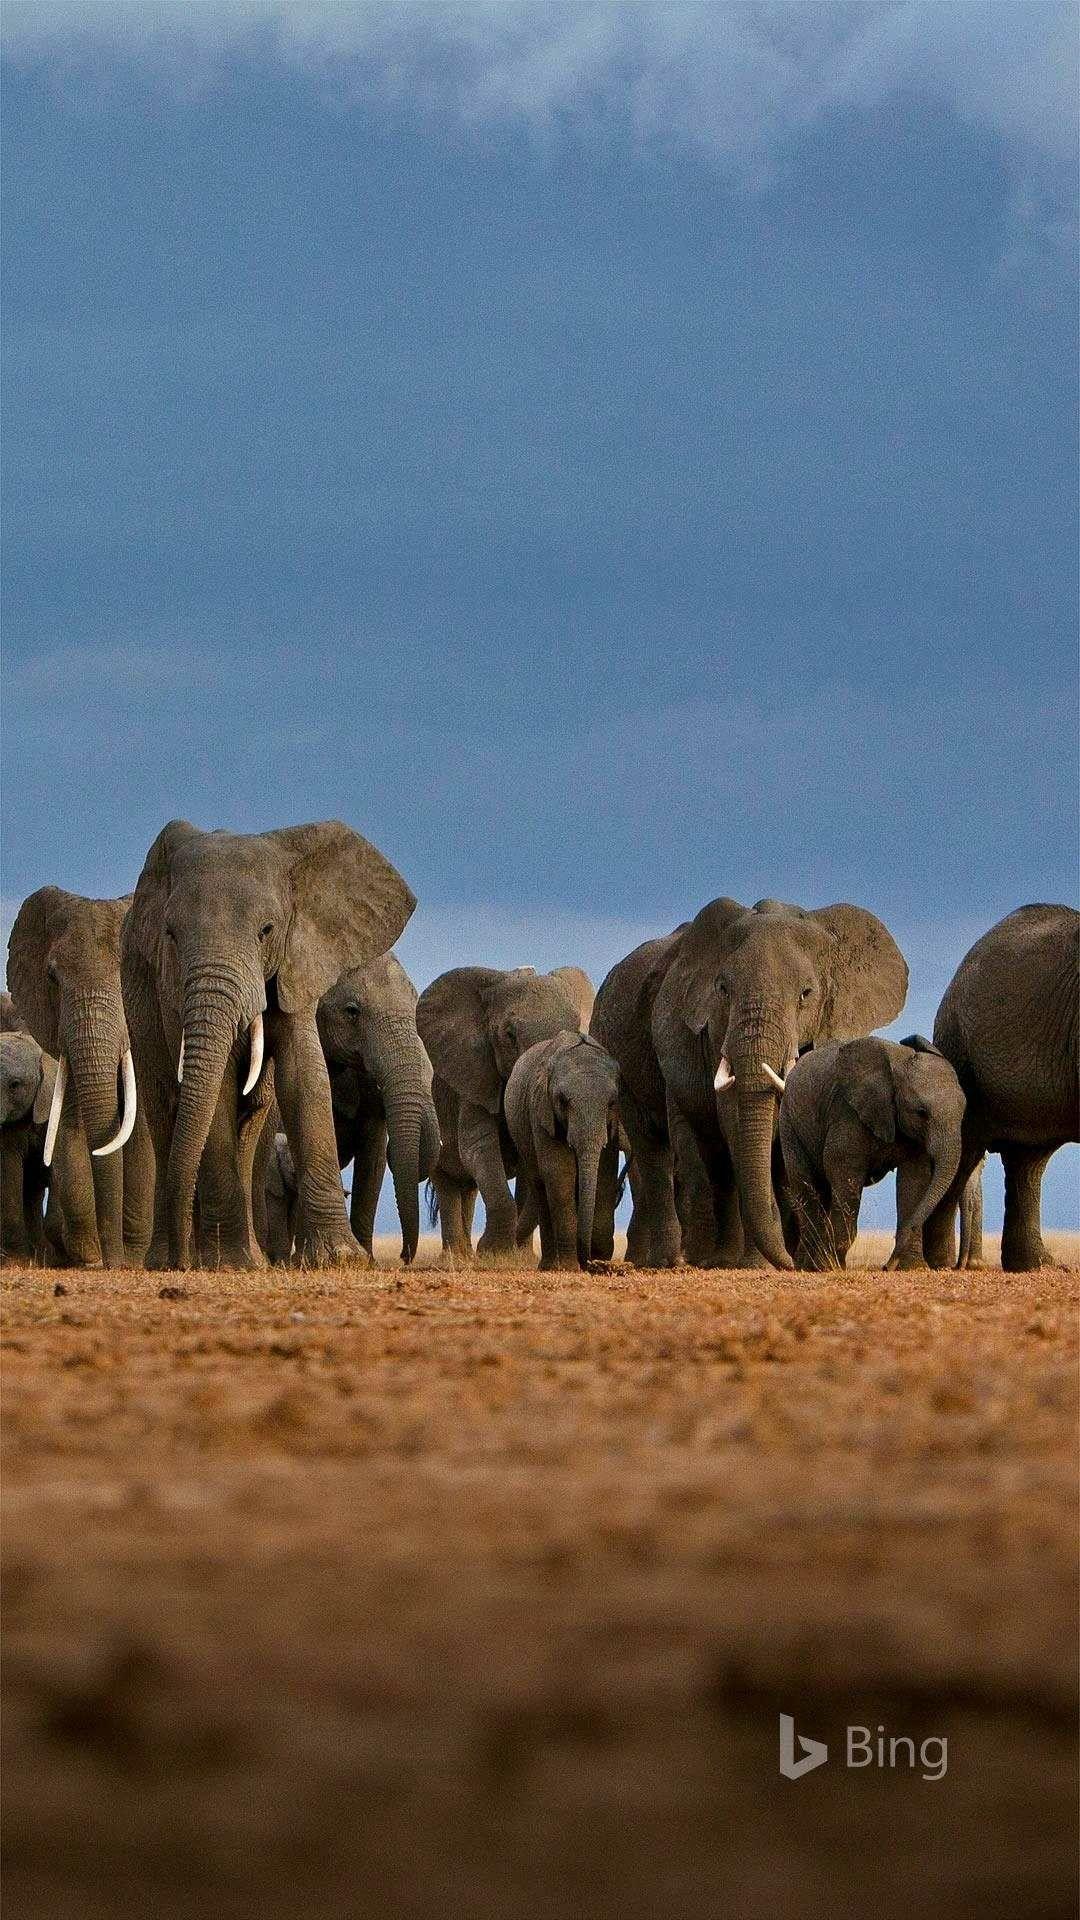 Pin by Jordan Morpheus on BING wallpaper Elephant